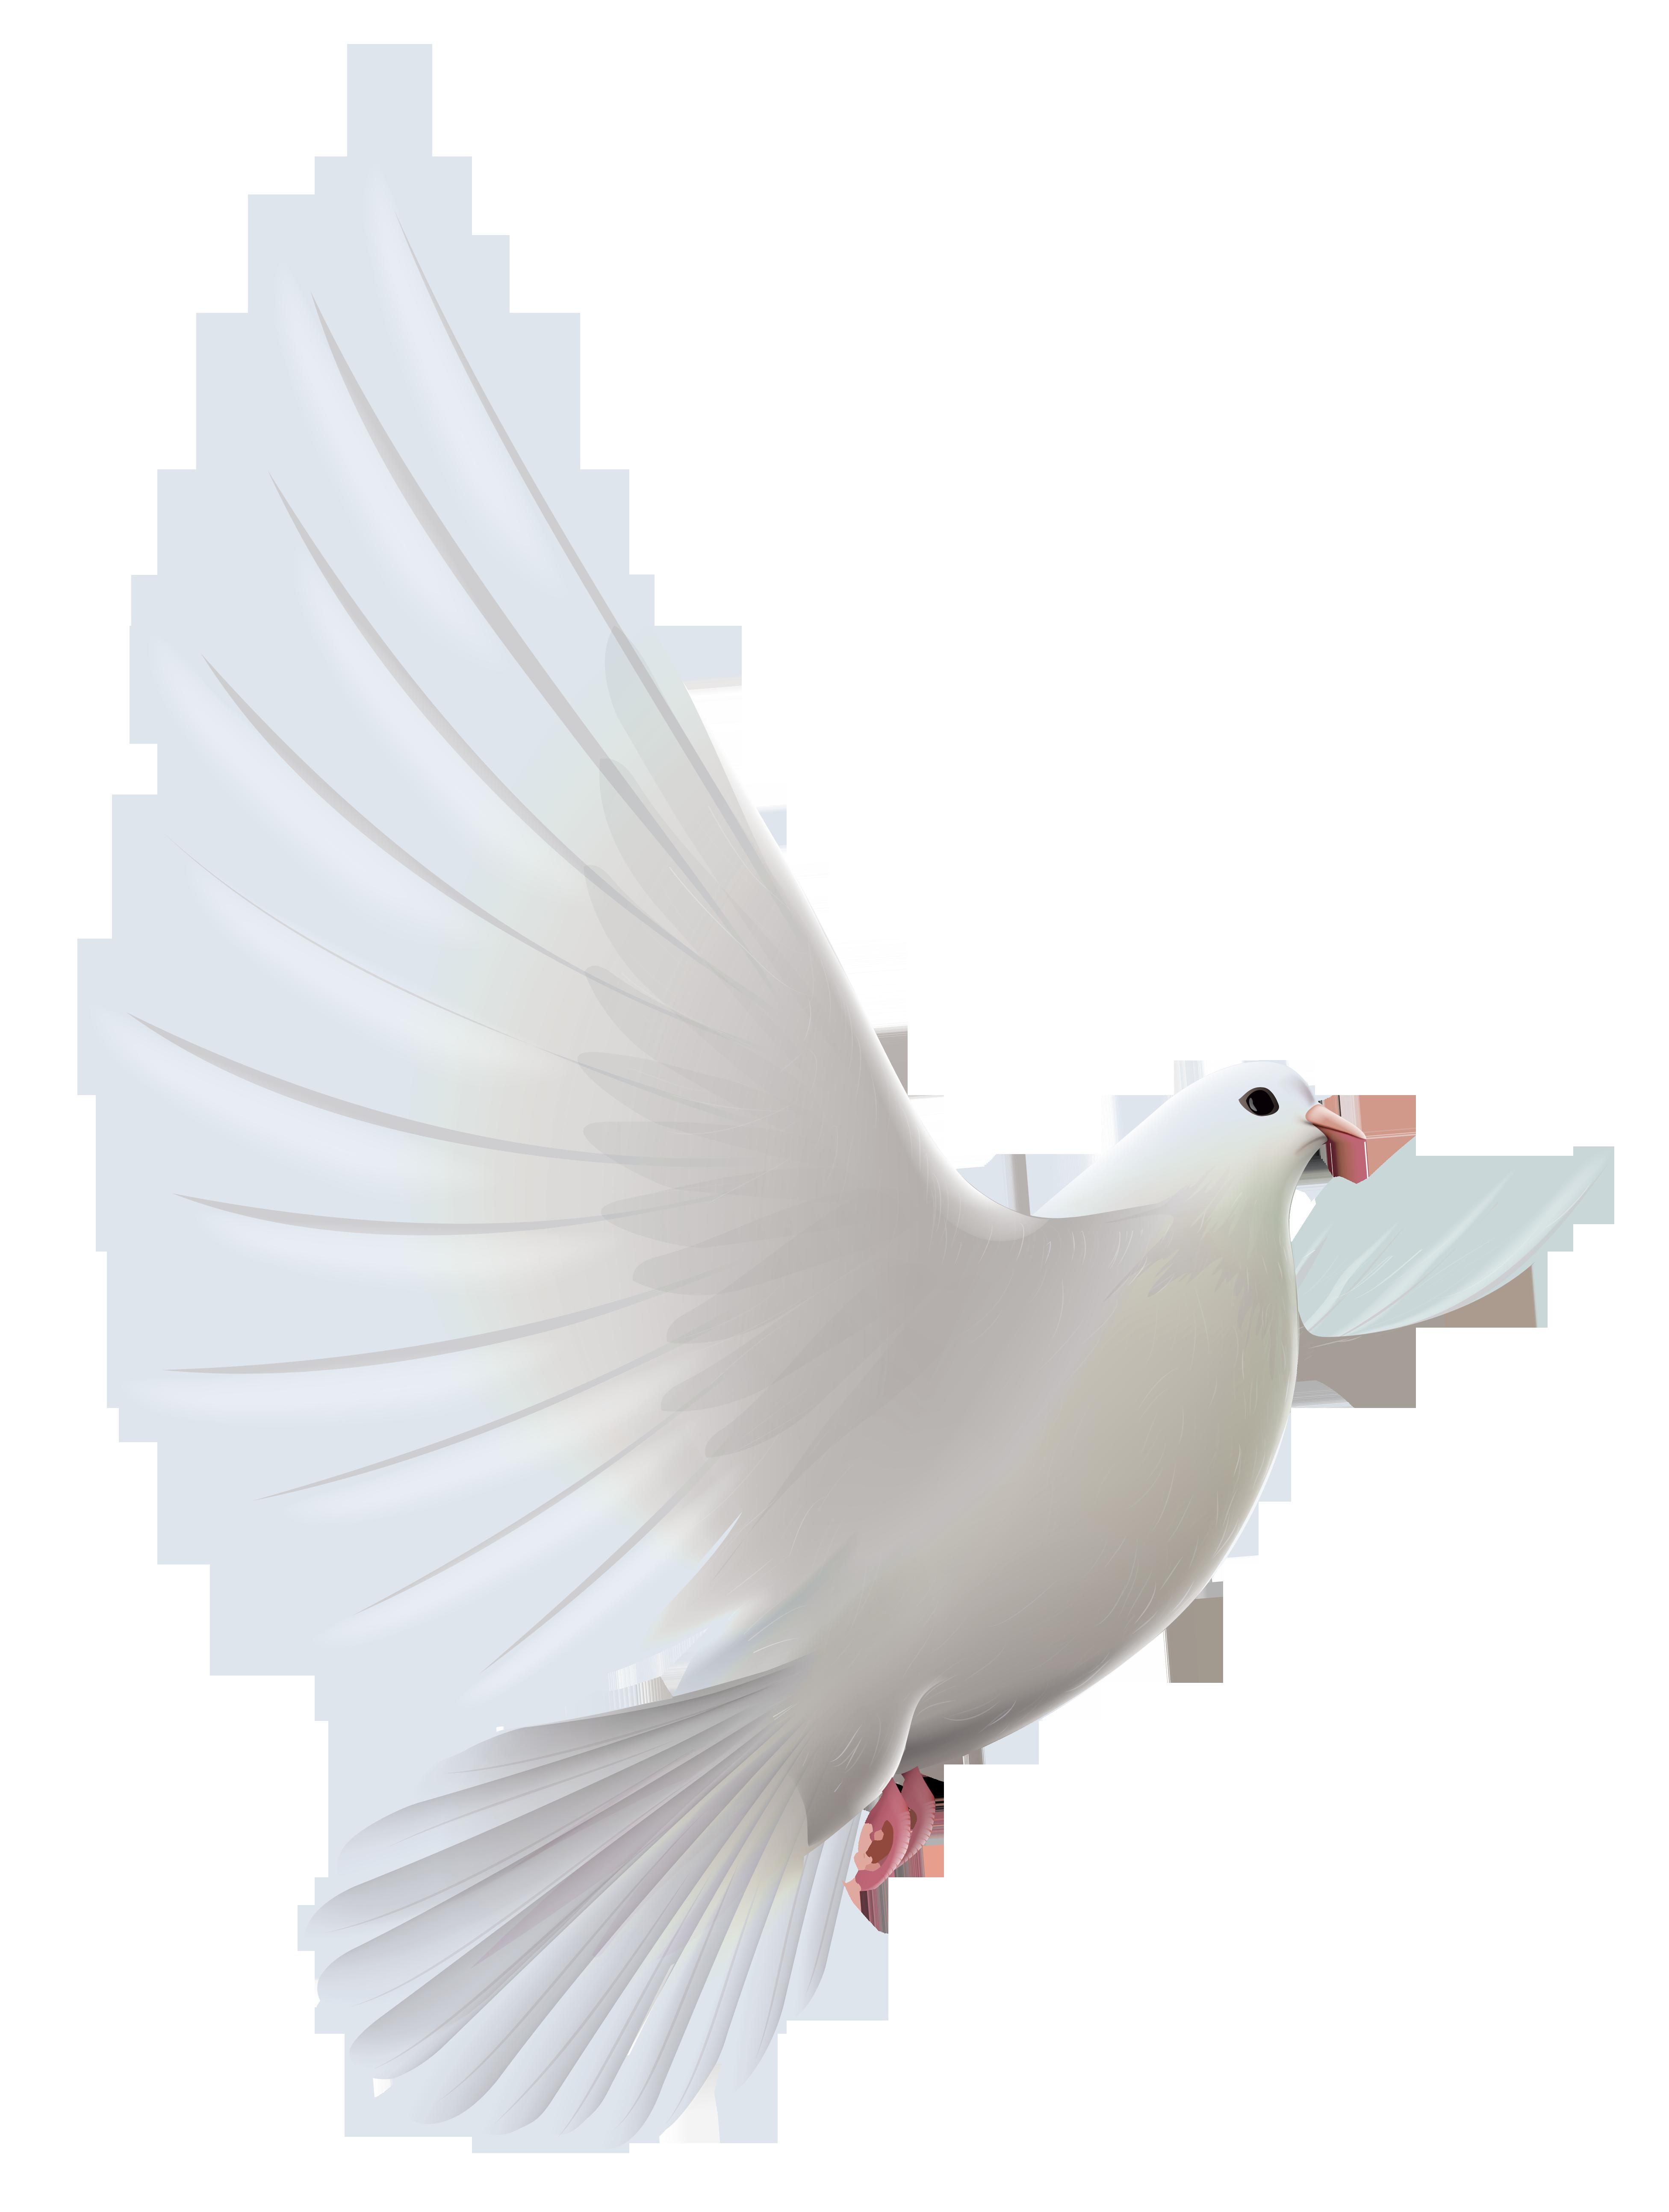 White dove transparent png. Peace clipart peacemaker